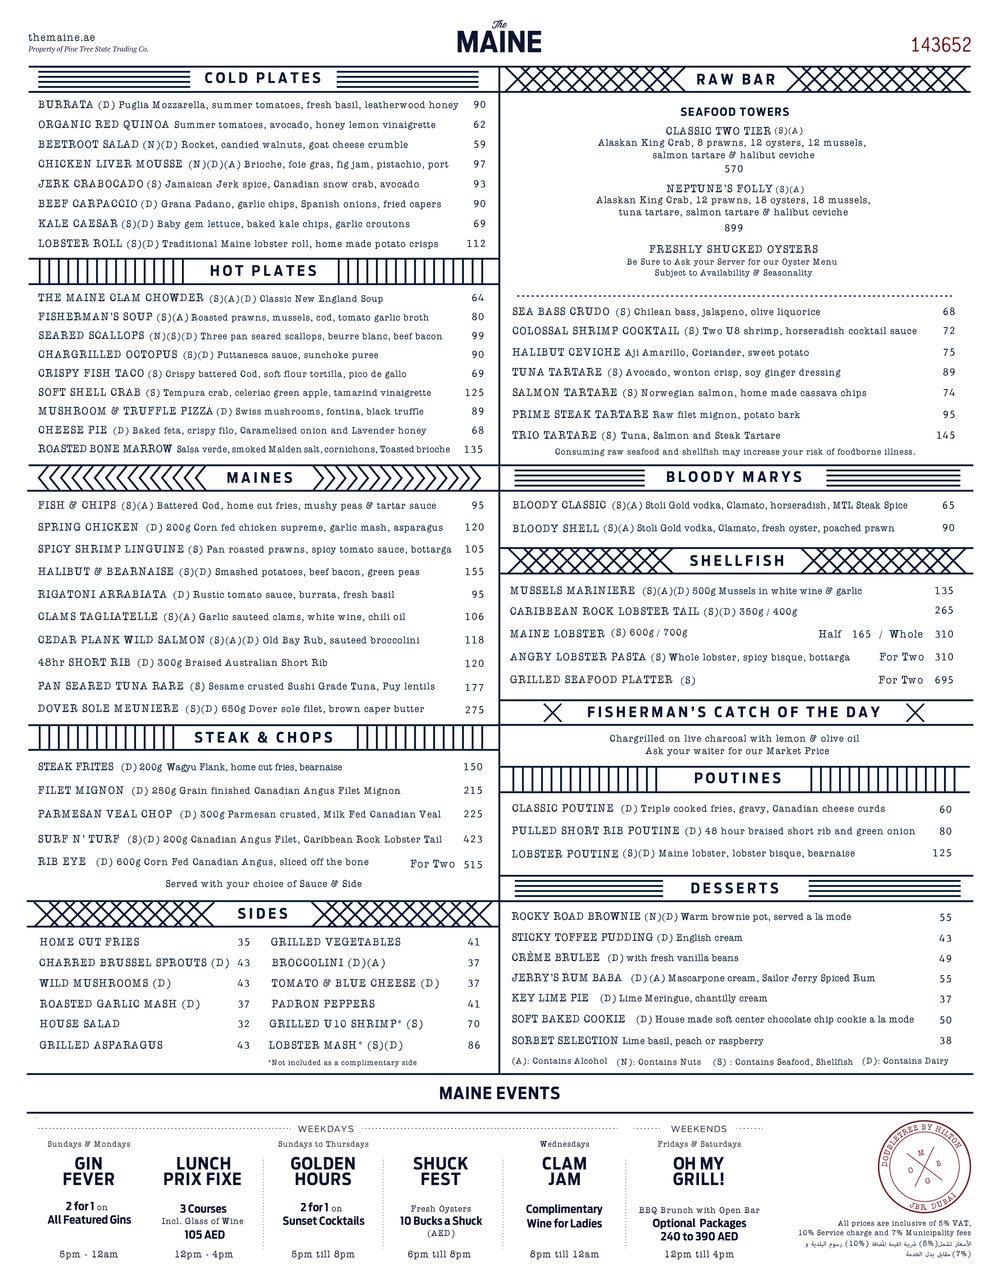 The MAINE Oyster Bar and Grill Dubai JBR